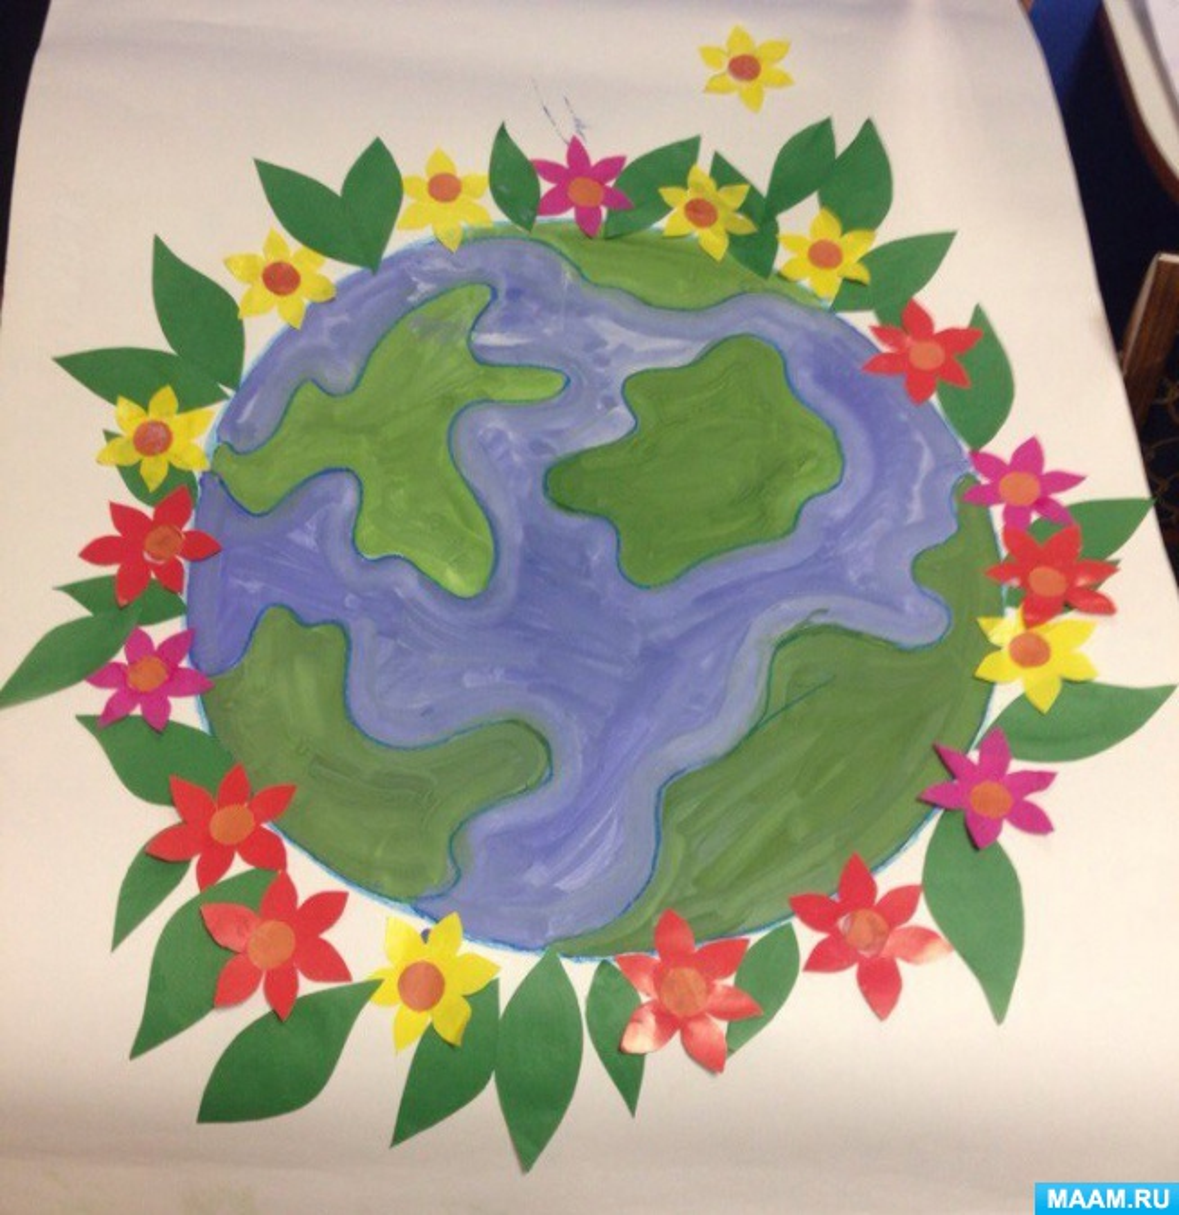 Создание стенгазеты «Наша цветущая планета». 2 младшая группа.